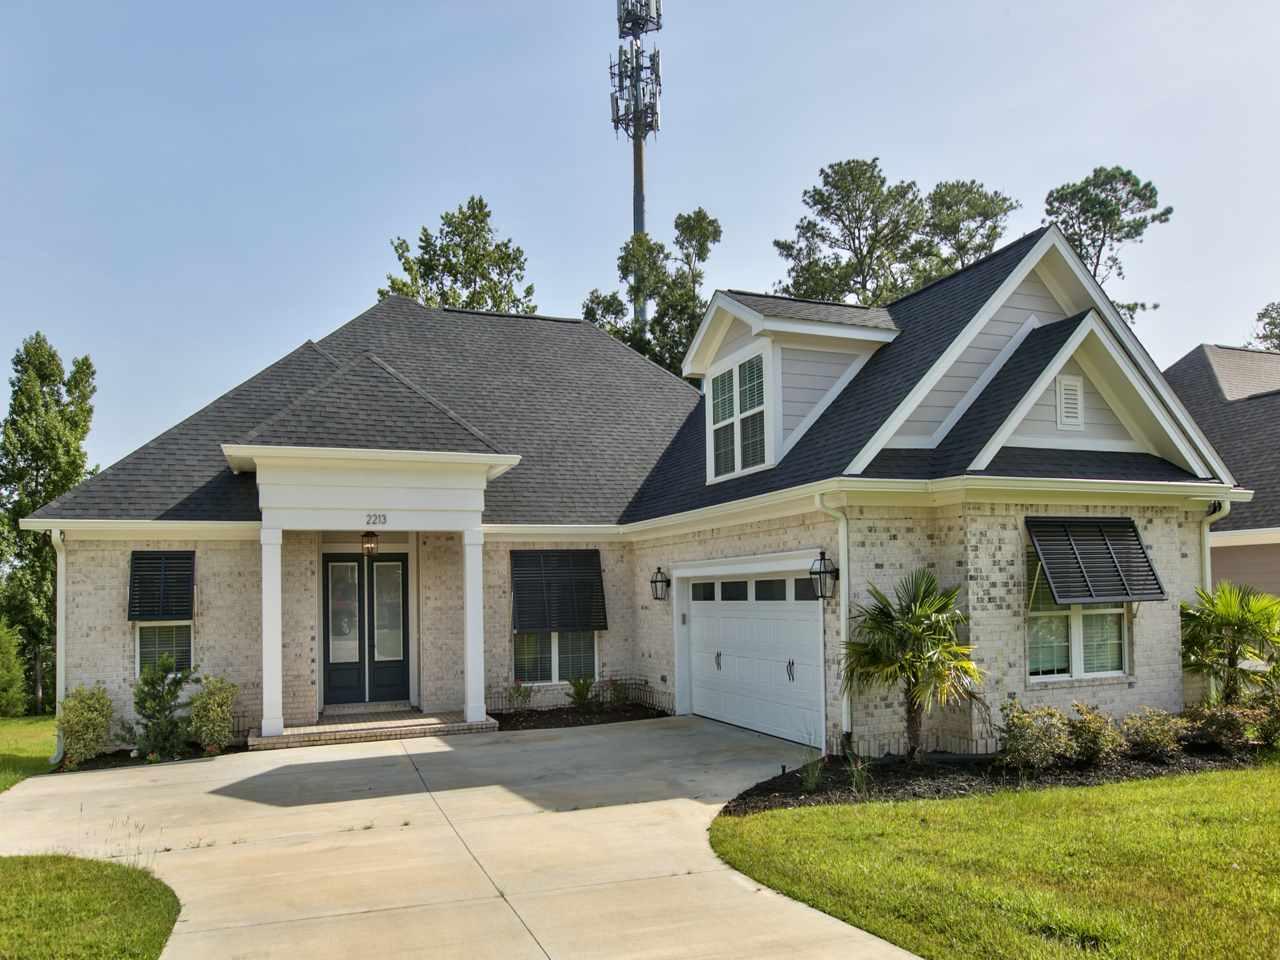 Property ID 308890